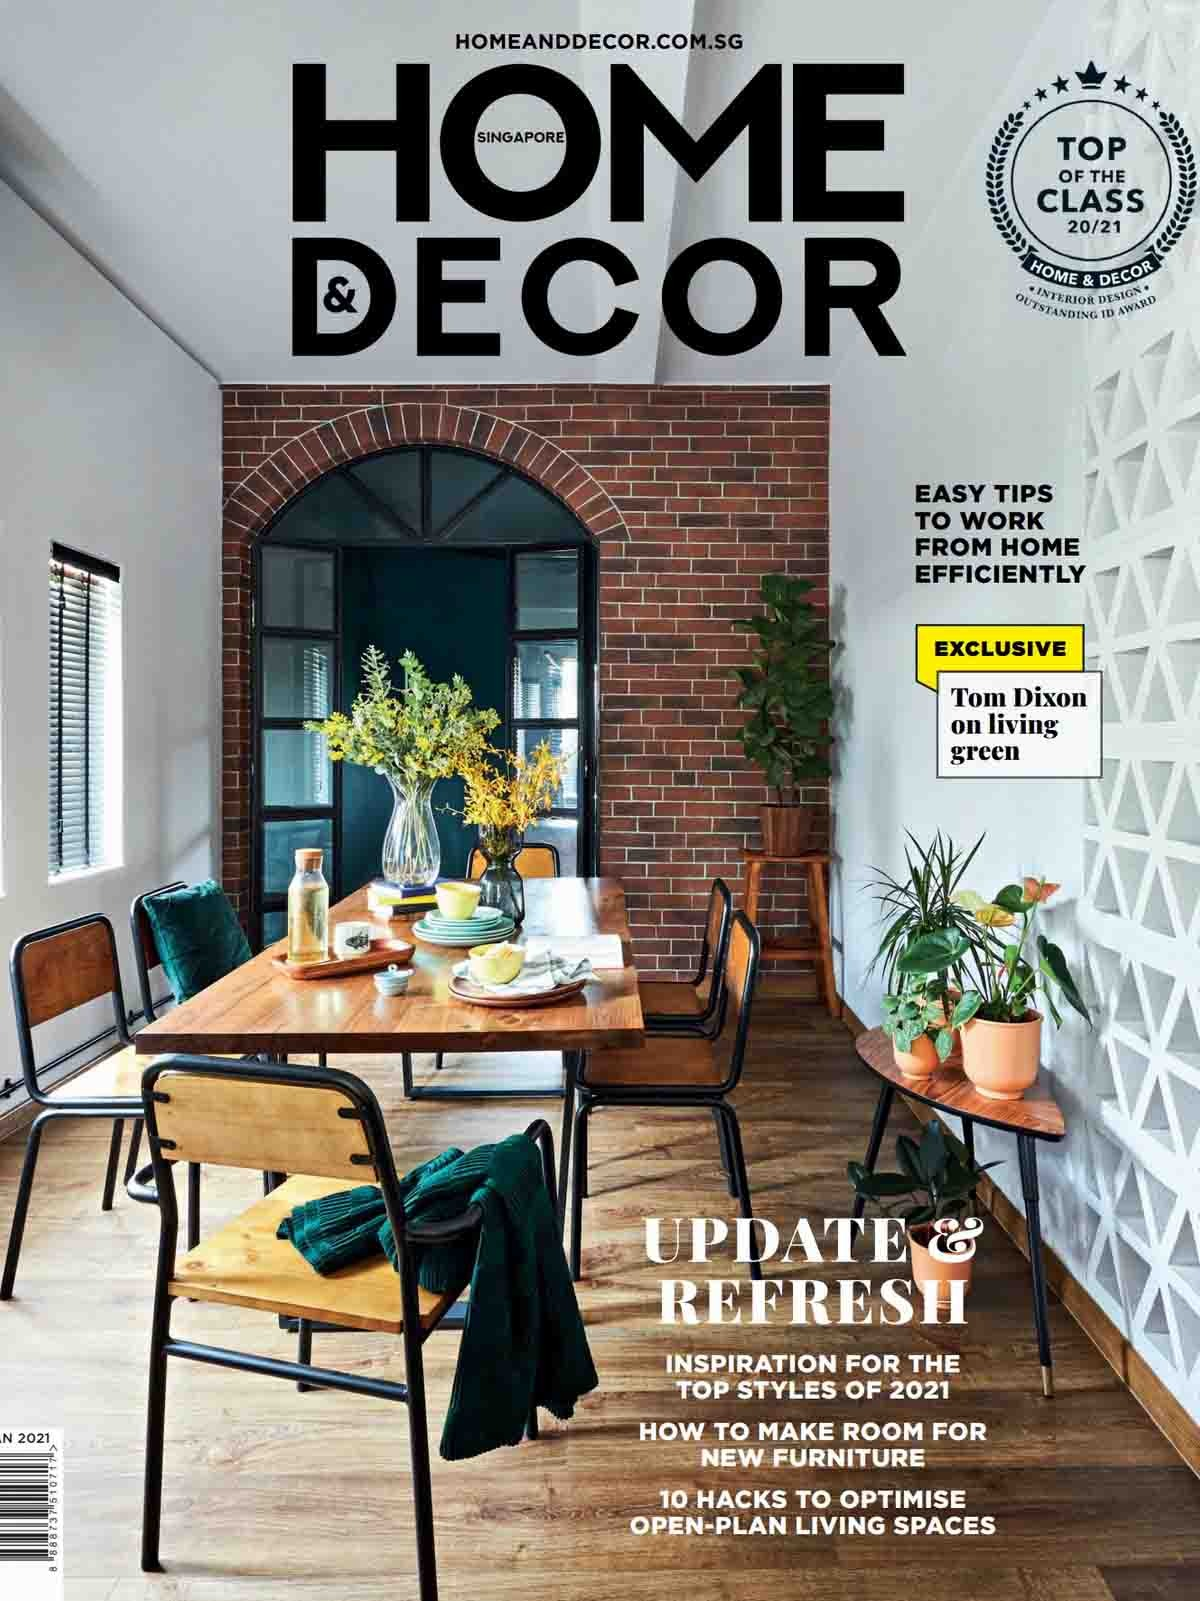 《Home & Decor》新加坡室内设计流行趋势杂志2021年01月号